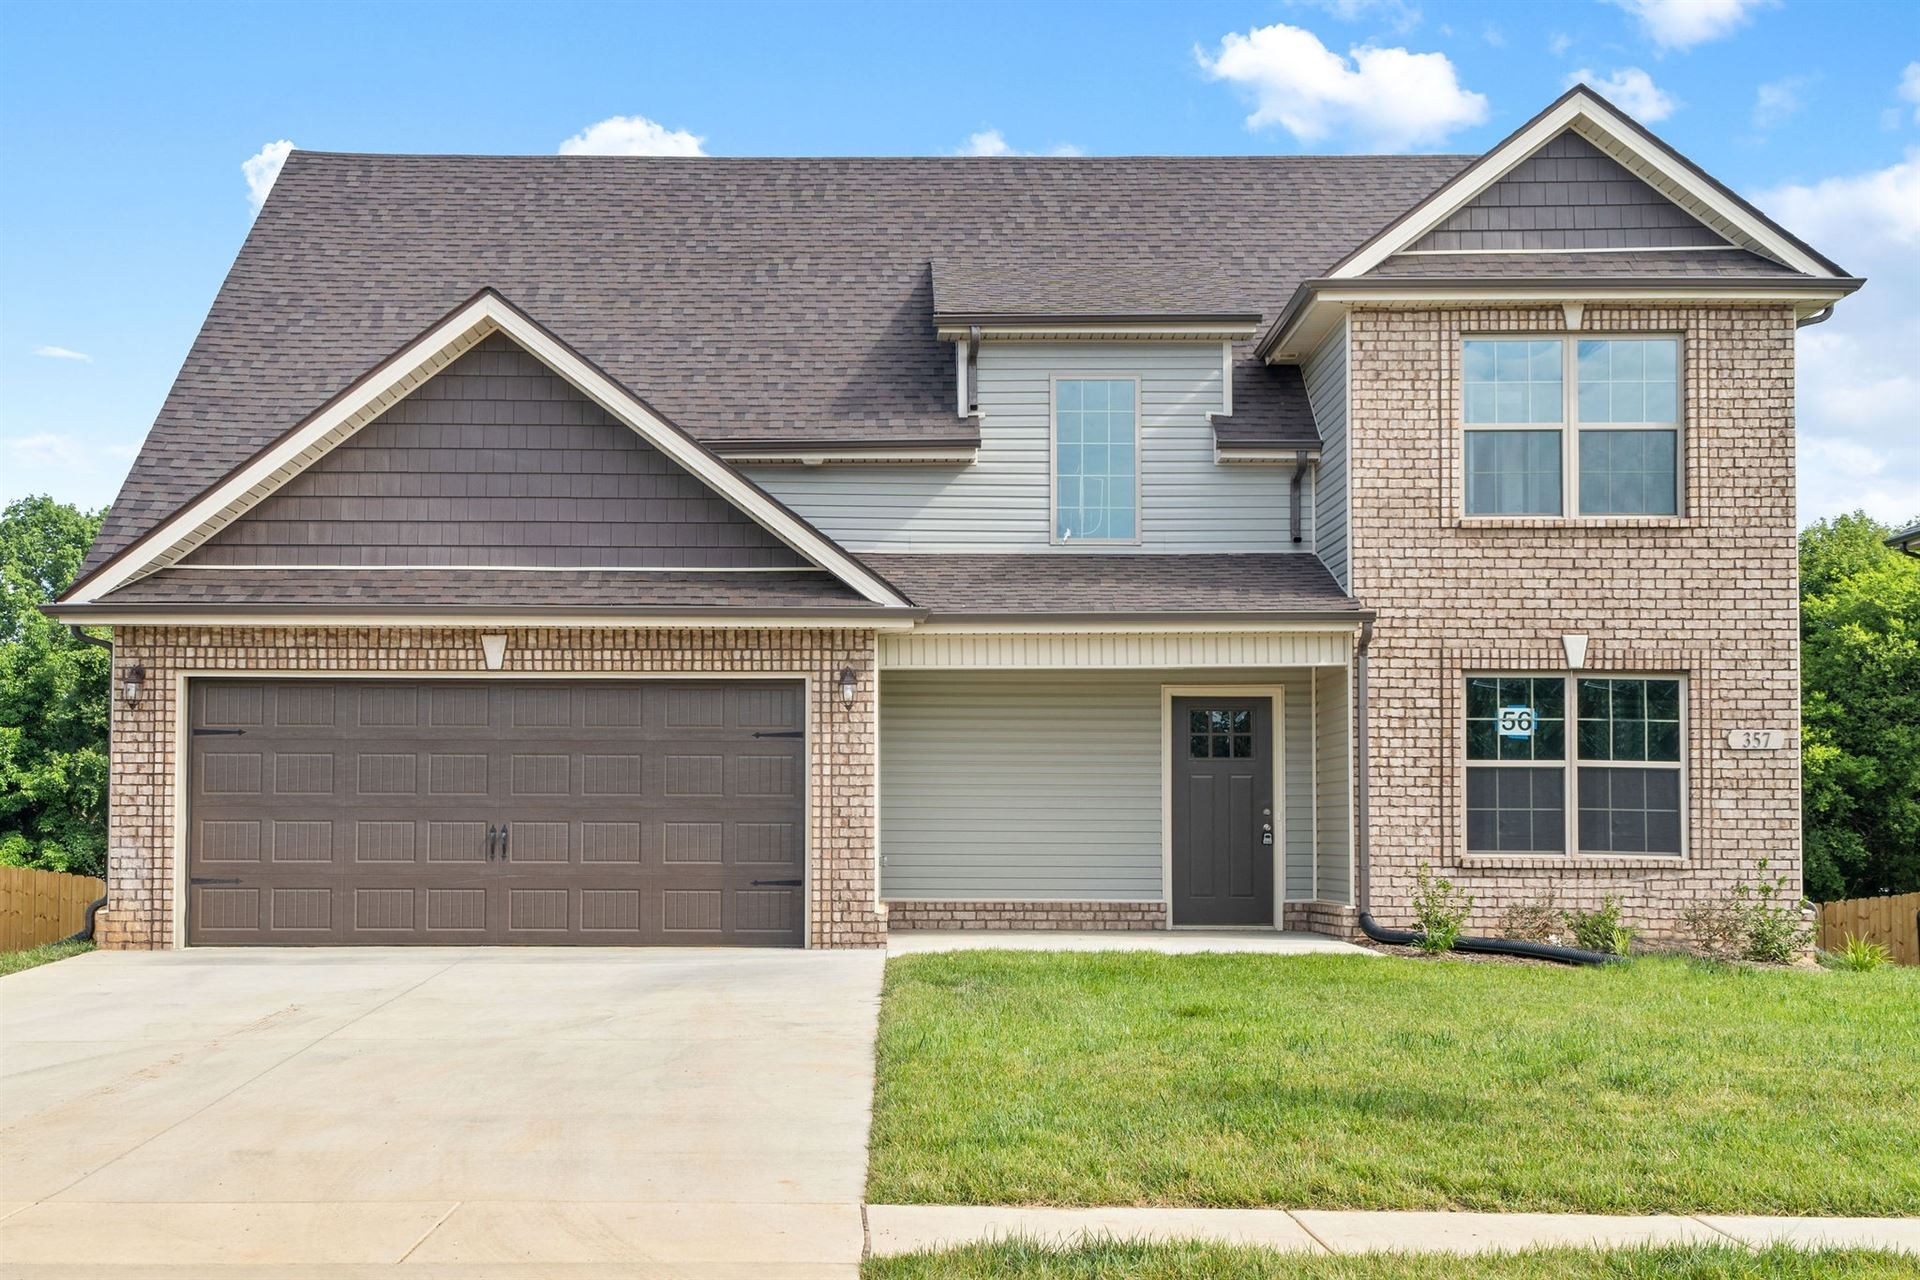 96 Dunbar, Clarksville, TN 37043 - MLS#: 2190020